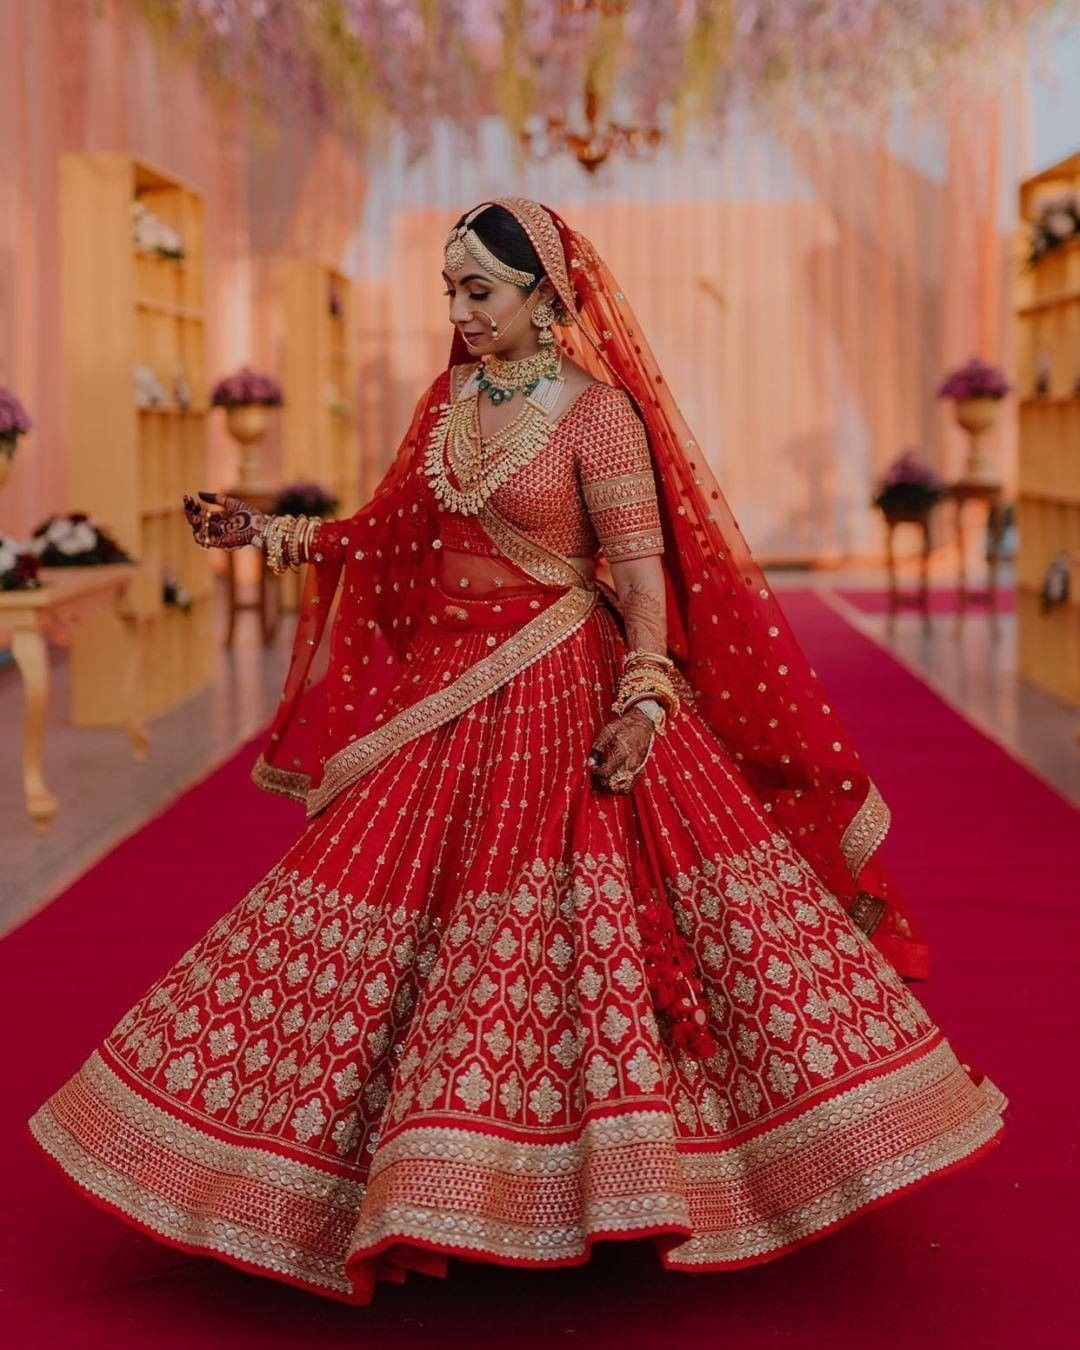 Red flared bridal lehenga in 2020 | Bridal lehenga red, Indian bridal  outfits, Latest bridal dresses